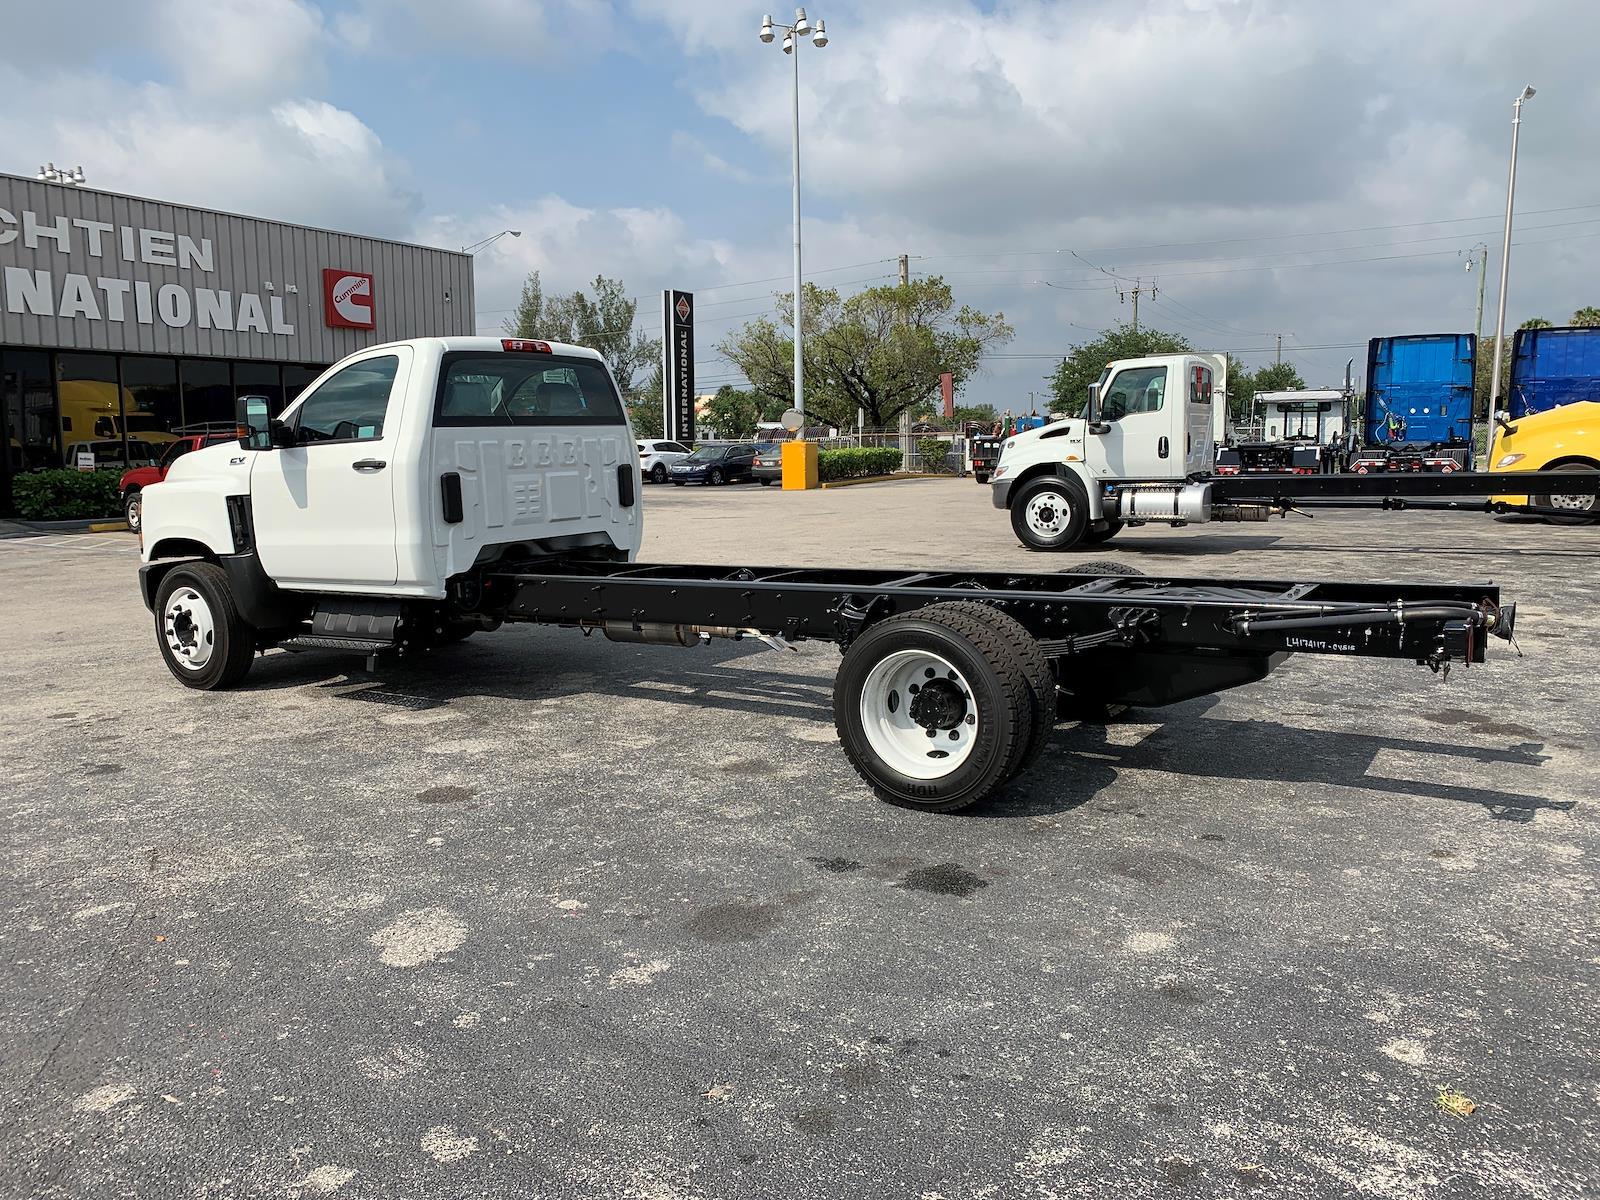 2022 International CV 4x4, Cab Chassis #PR-265948 - photo 1